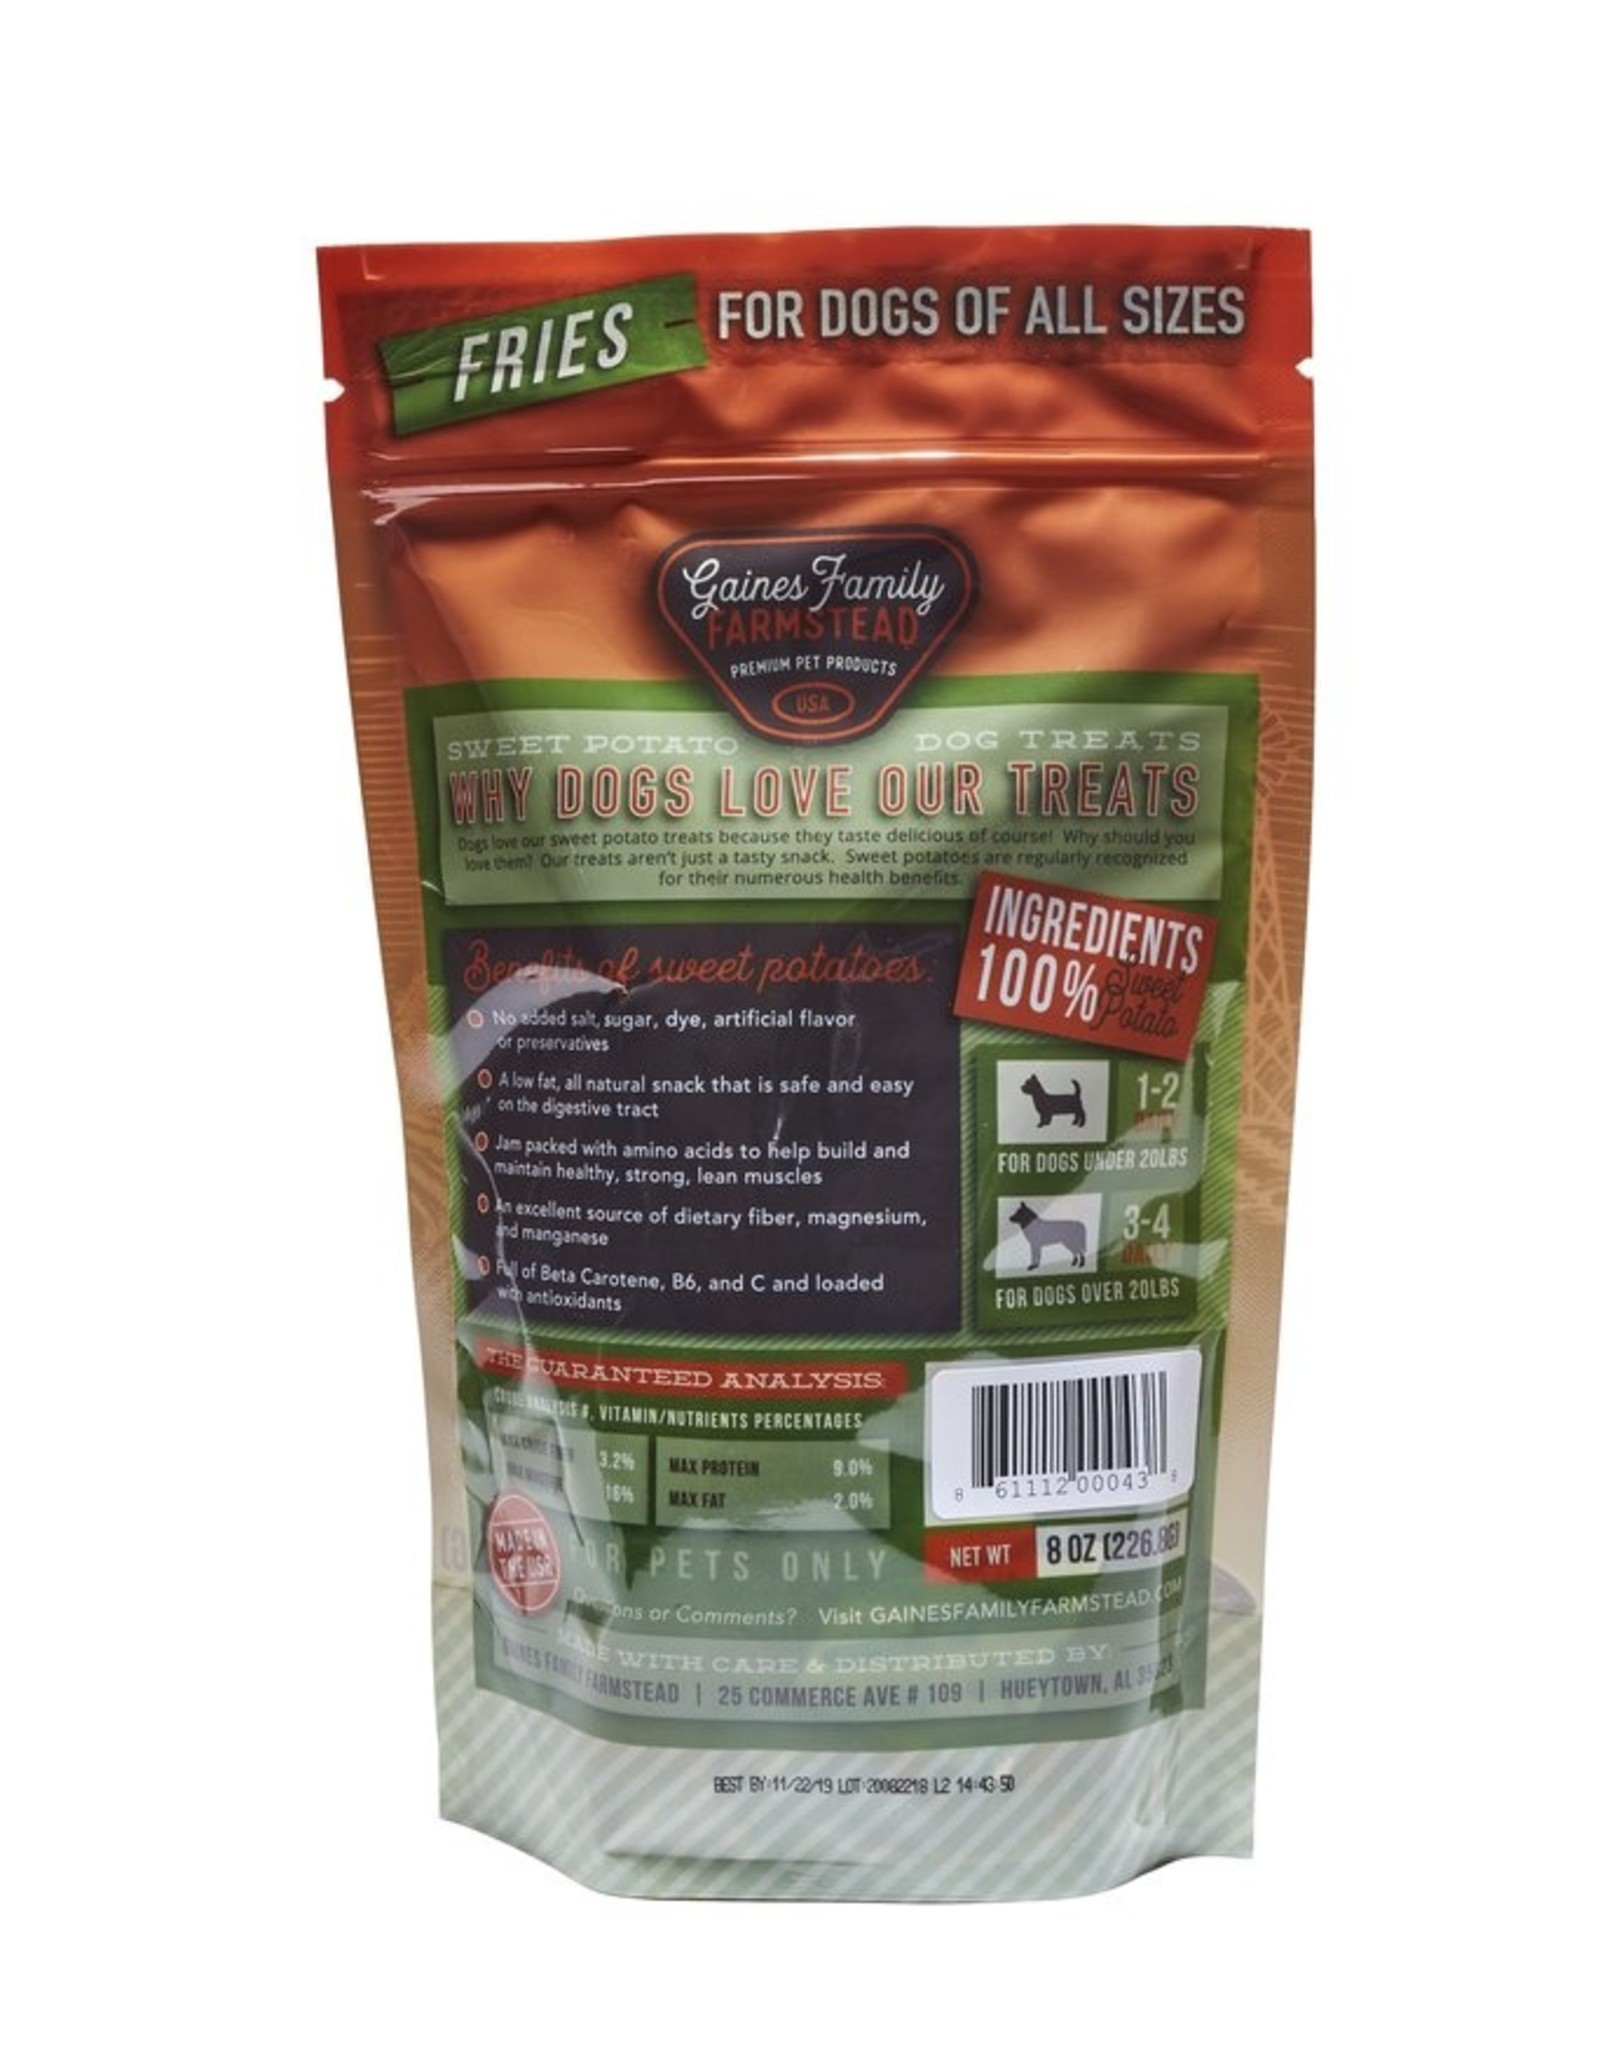 Gaines Family Farmstead Gaines Family Farmstead Sweet Potato Fries